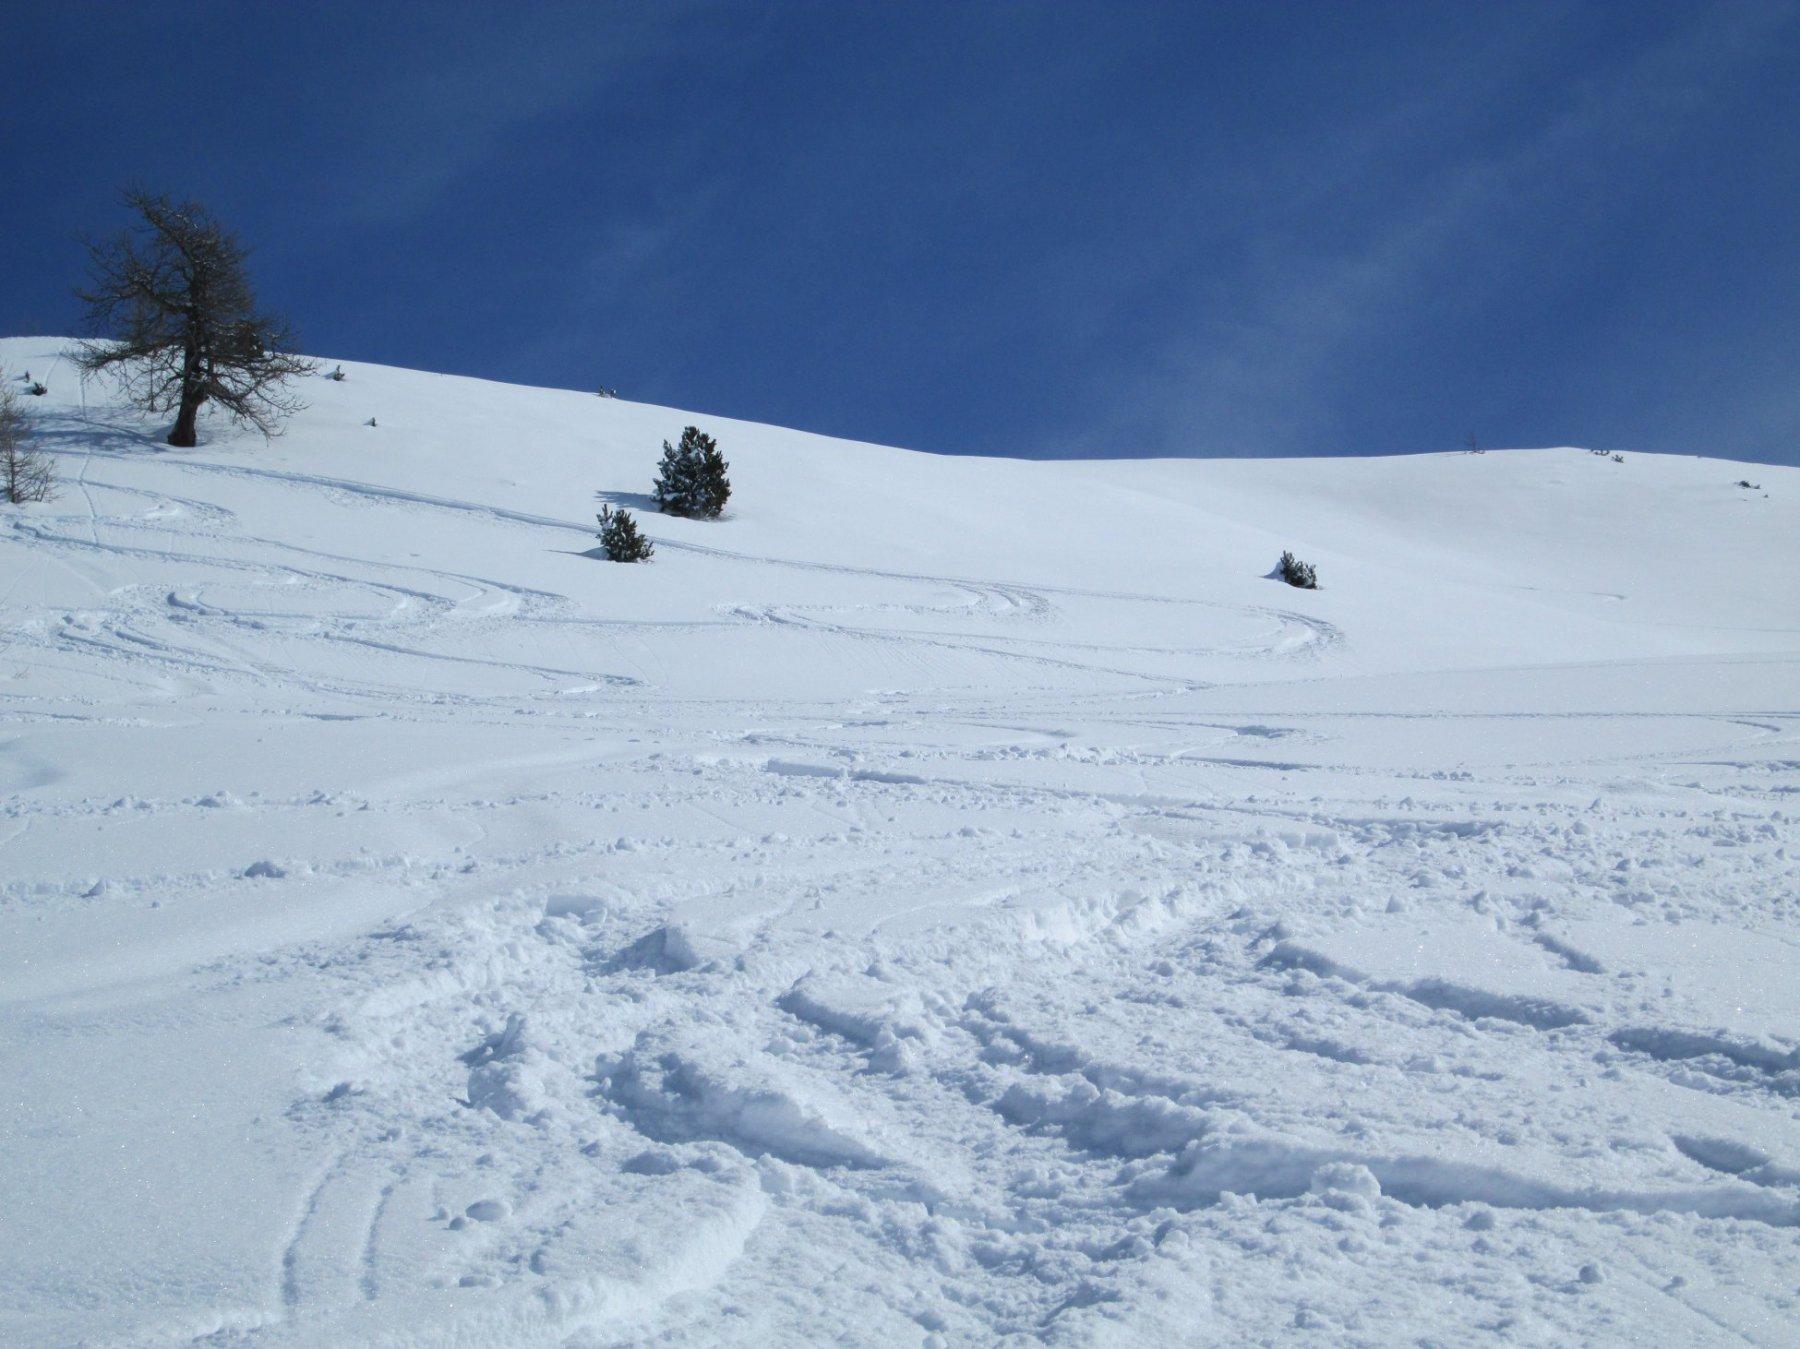 neve farinosa in discesa